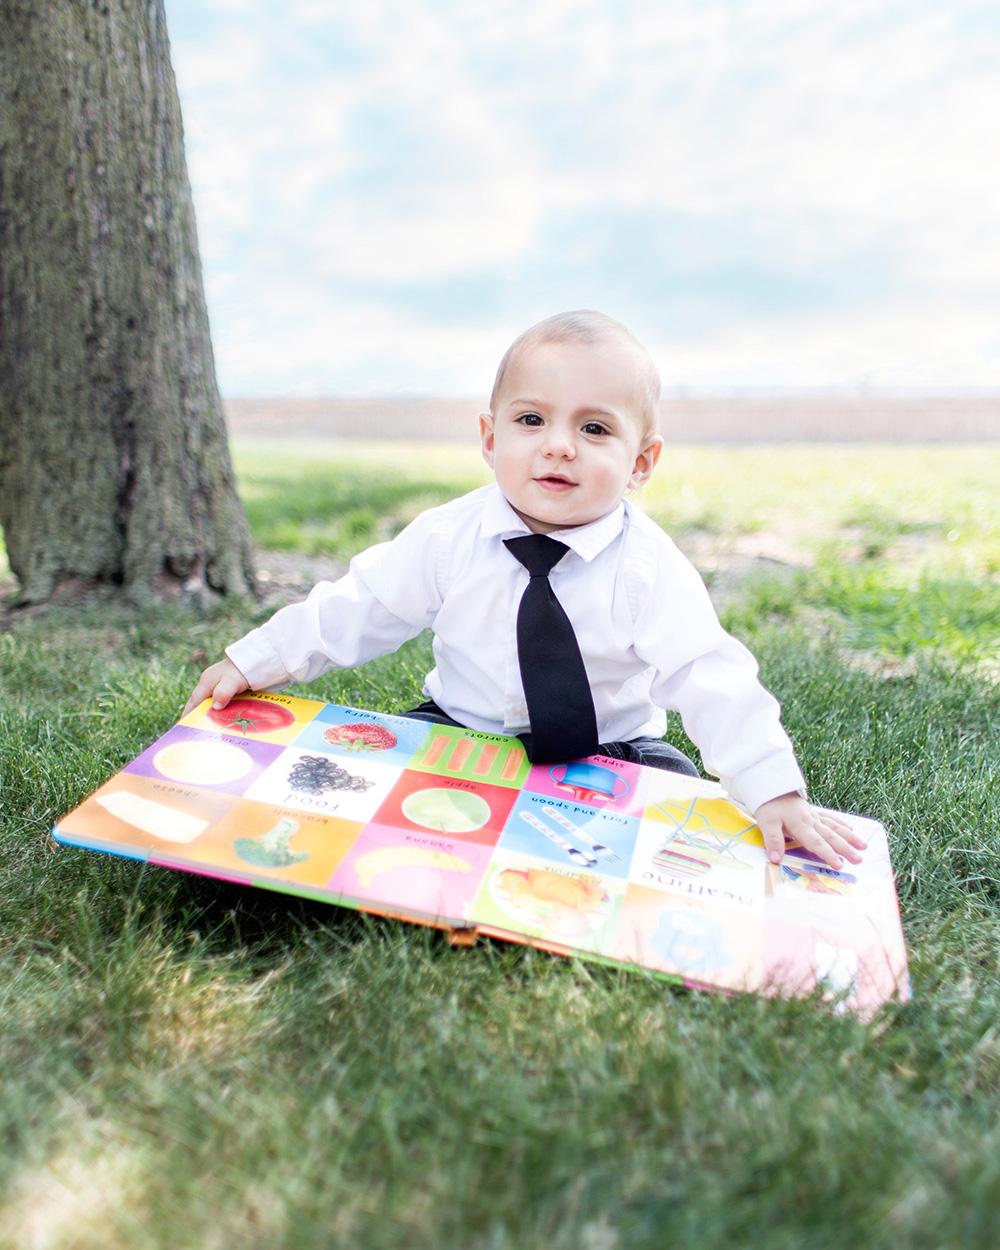 kids-nj-family-child-childrensphotography-childphotographer-familyphotographer-familyphotography-njfamily-njmom